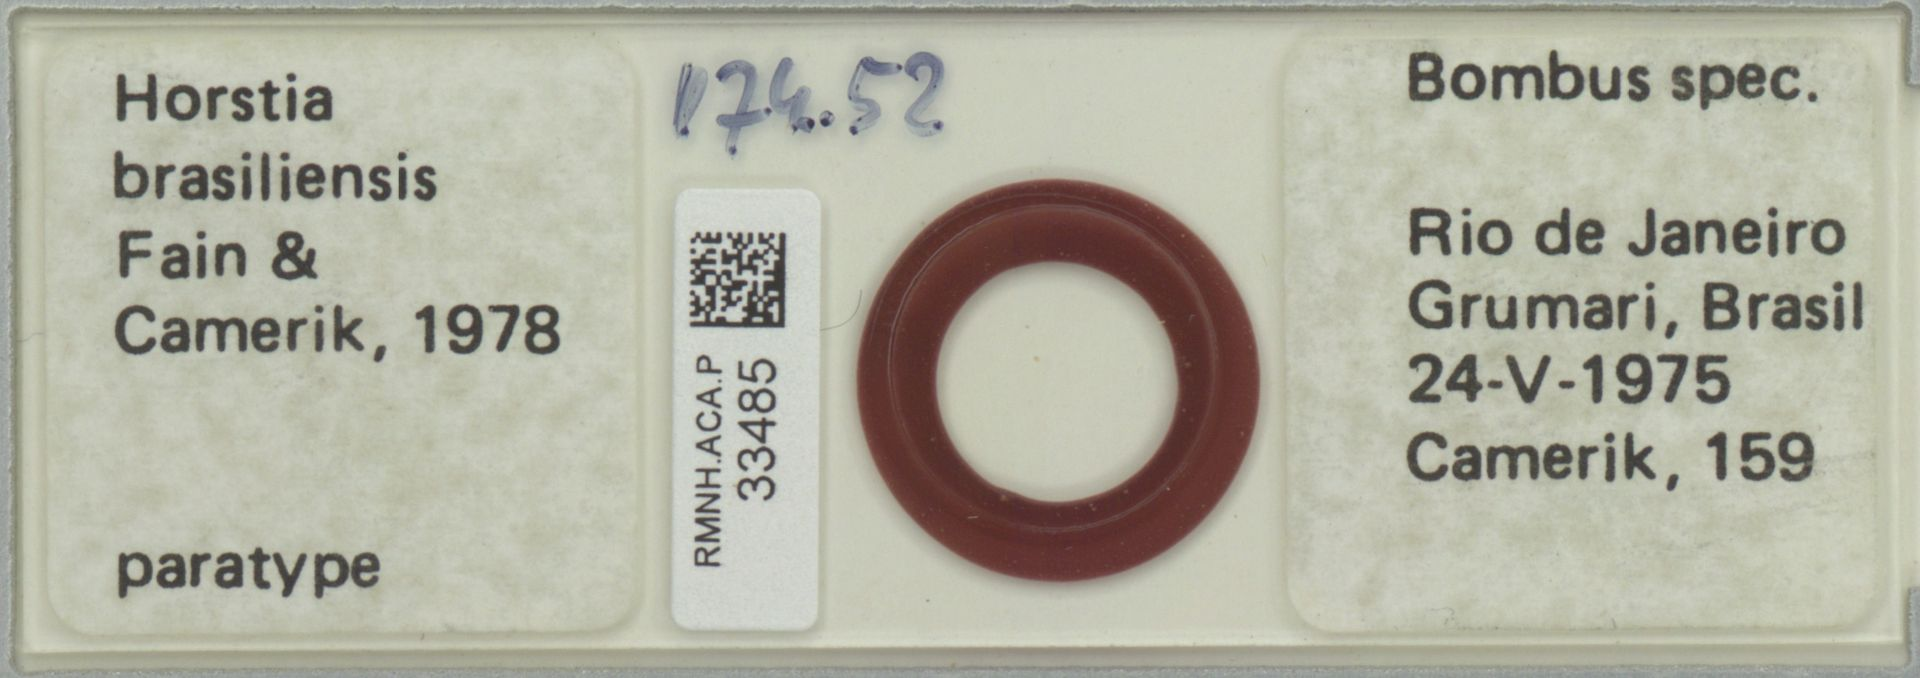 RMNH.ACA.P.33485 | Horstia brasiliensis Fain & Camerik 1978